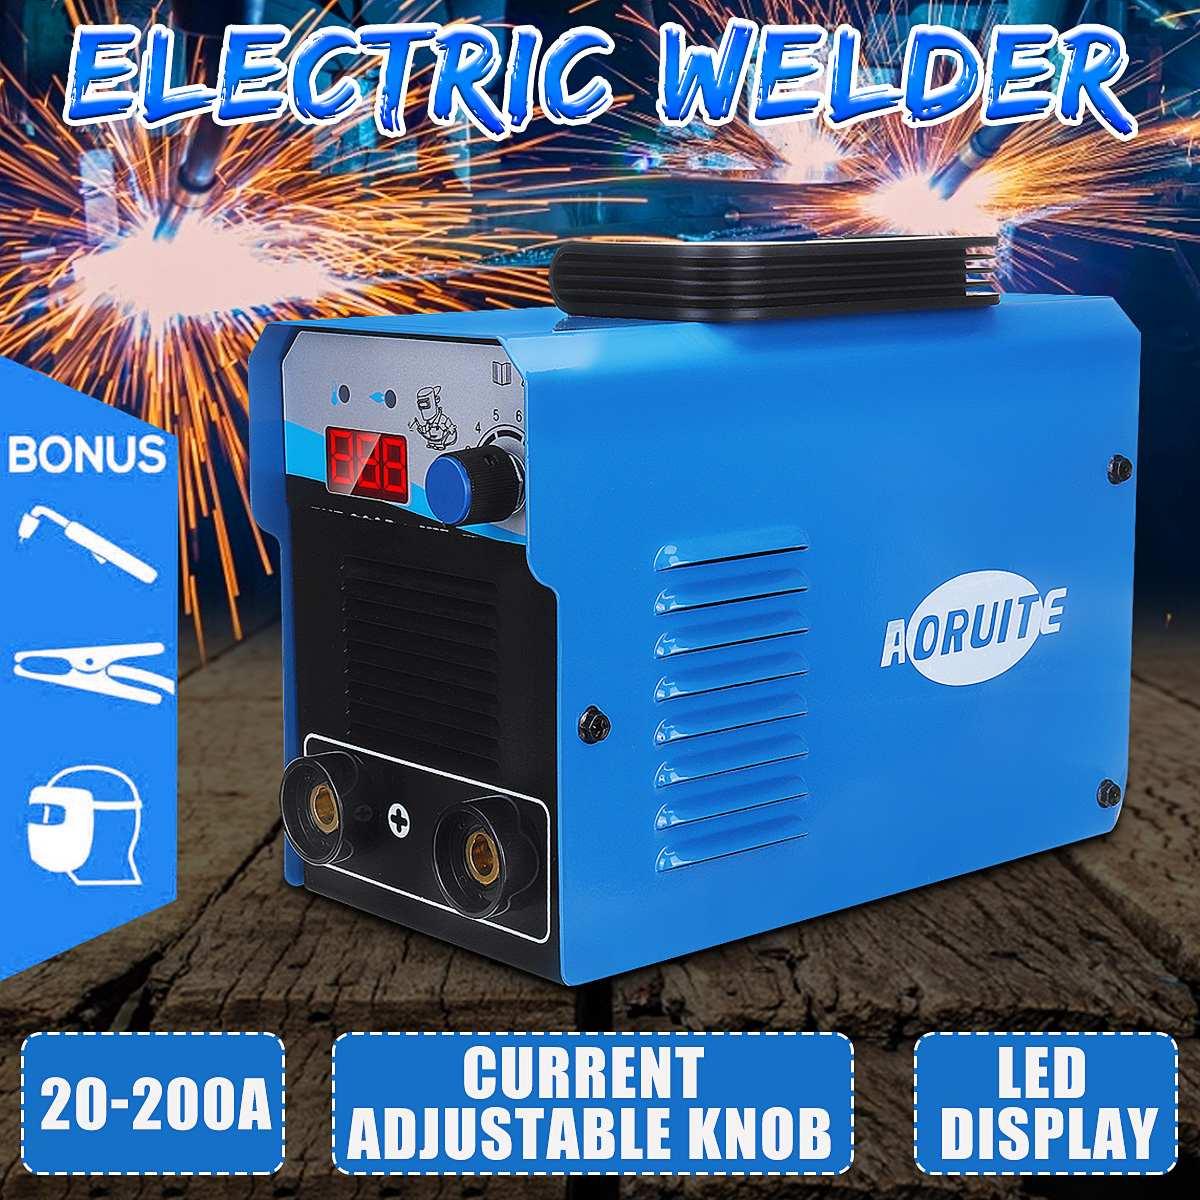 Electric Welder 200A Portable Welding Machine Power MMA IGBT Inverter Welder LCD Display 110V/220V Welding Tool Energy Saving